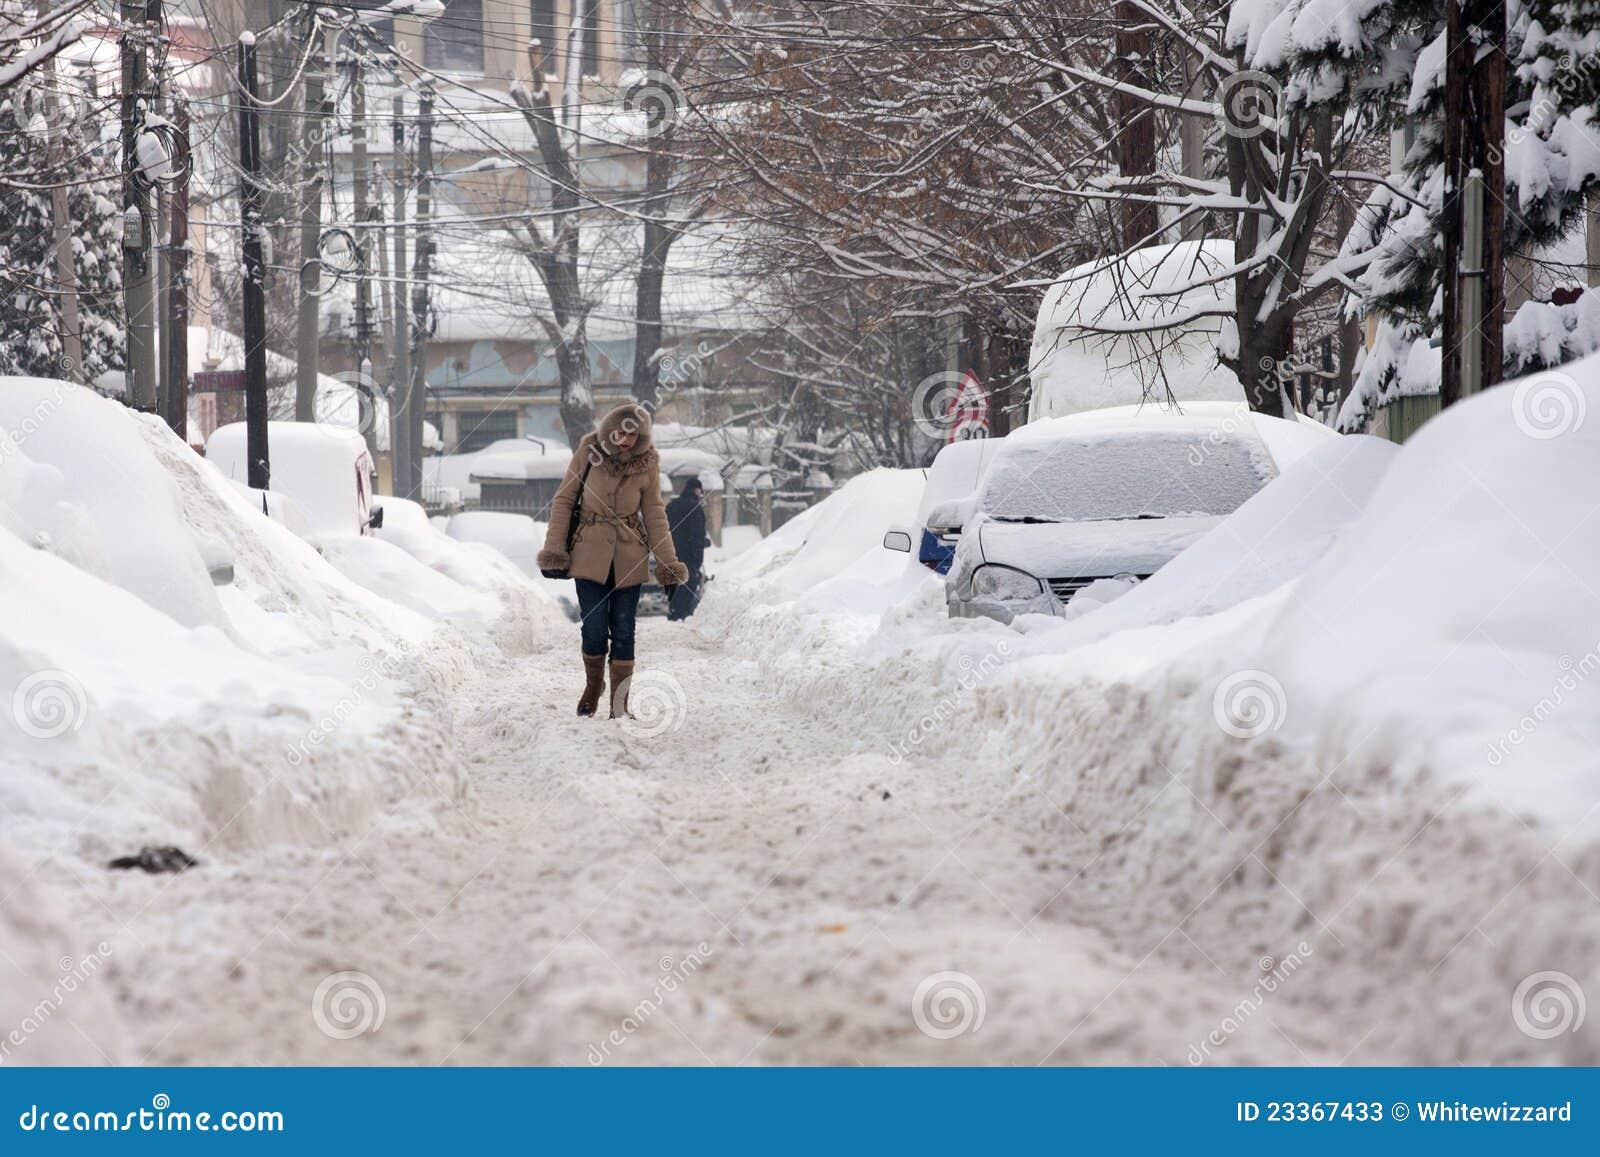 Bucharest Romania February 14 Weather Anomalies Editorial Stock Photo Image Of Transportation Anomalies 23367433